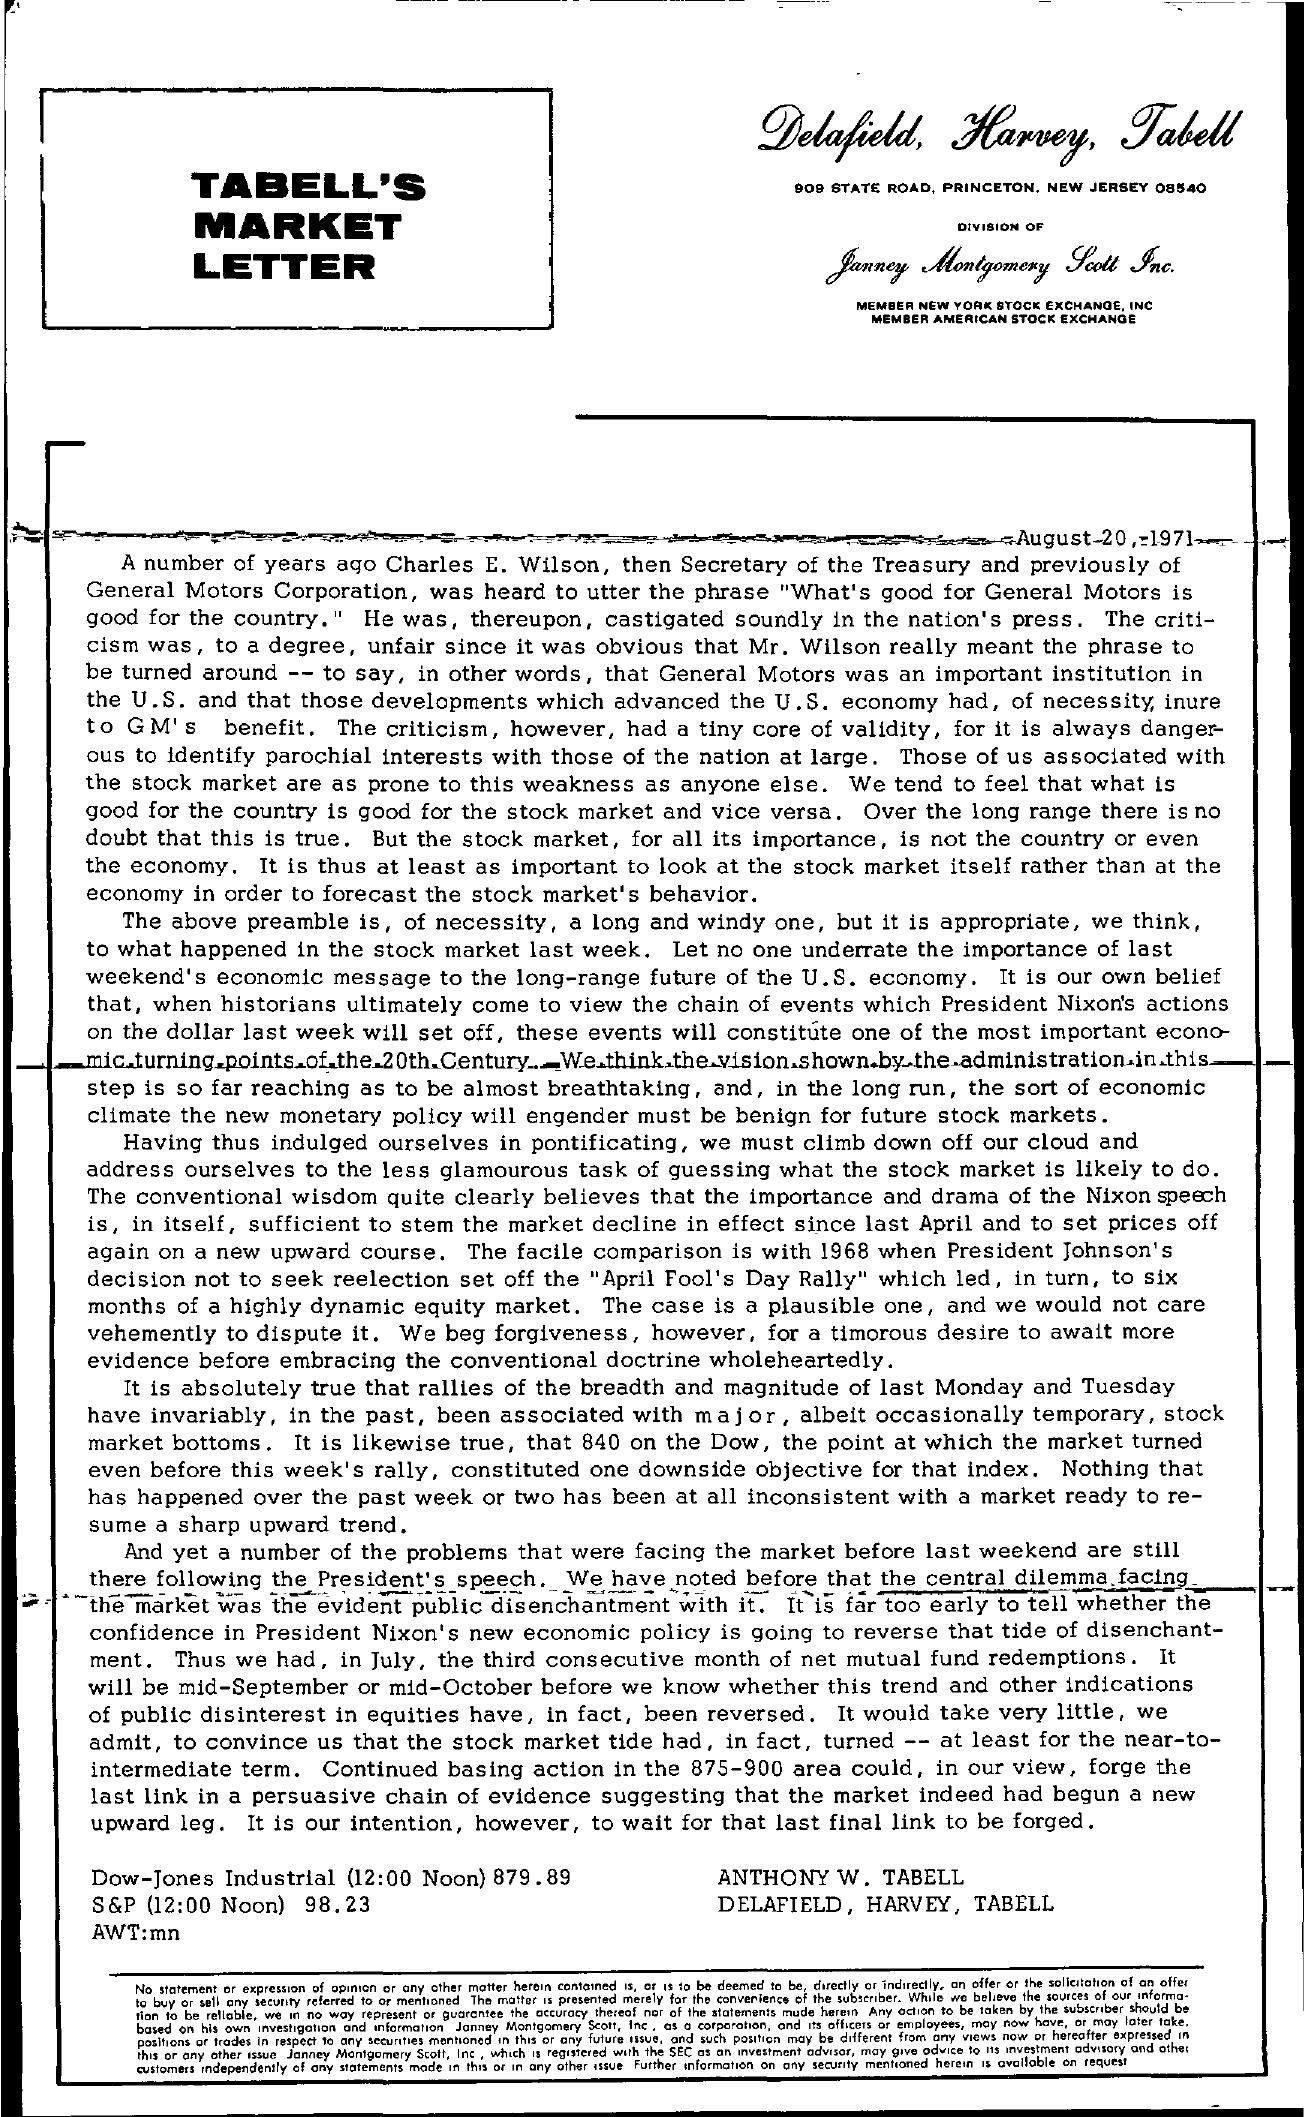 Tabell's Market Letter - August 20, 1971